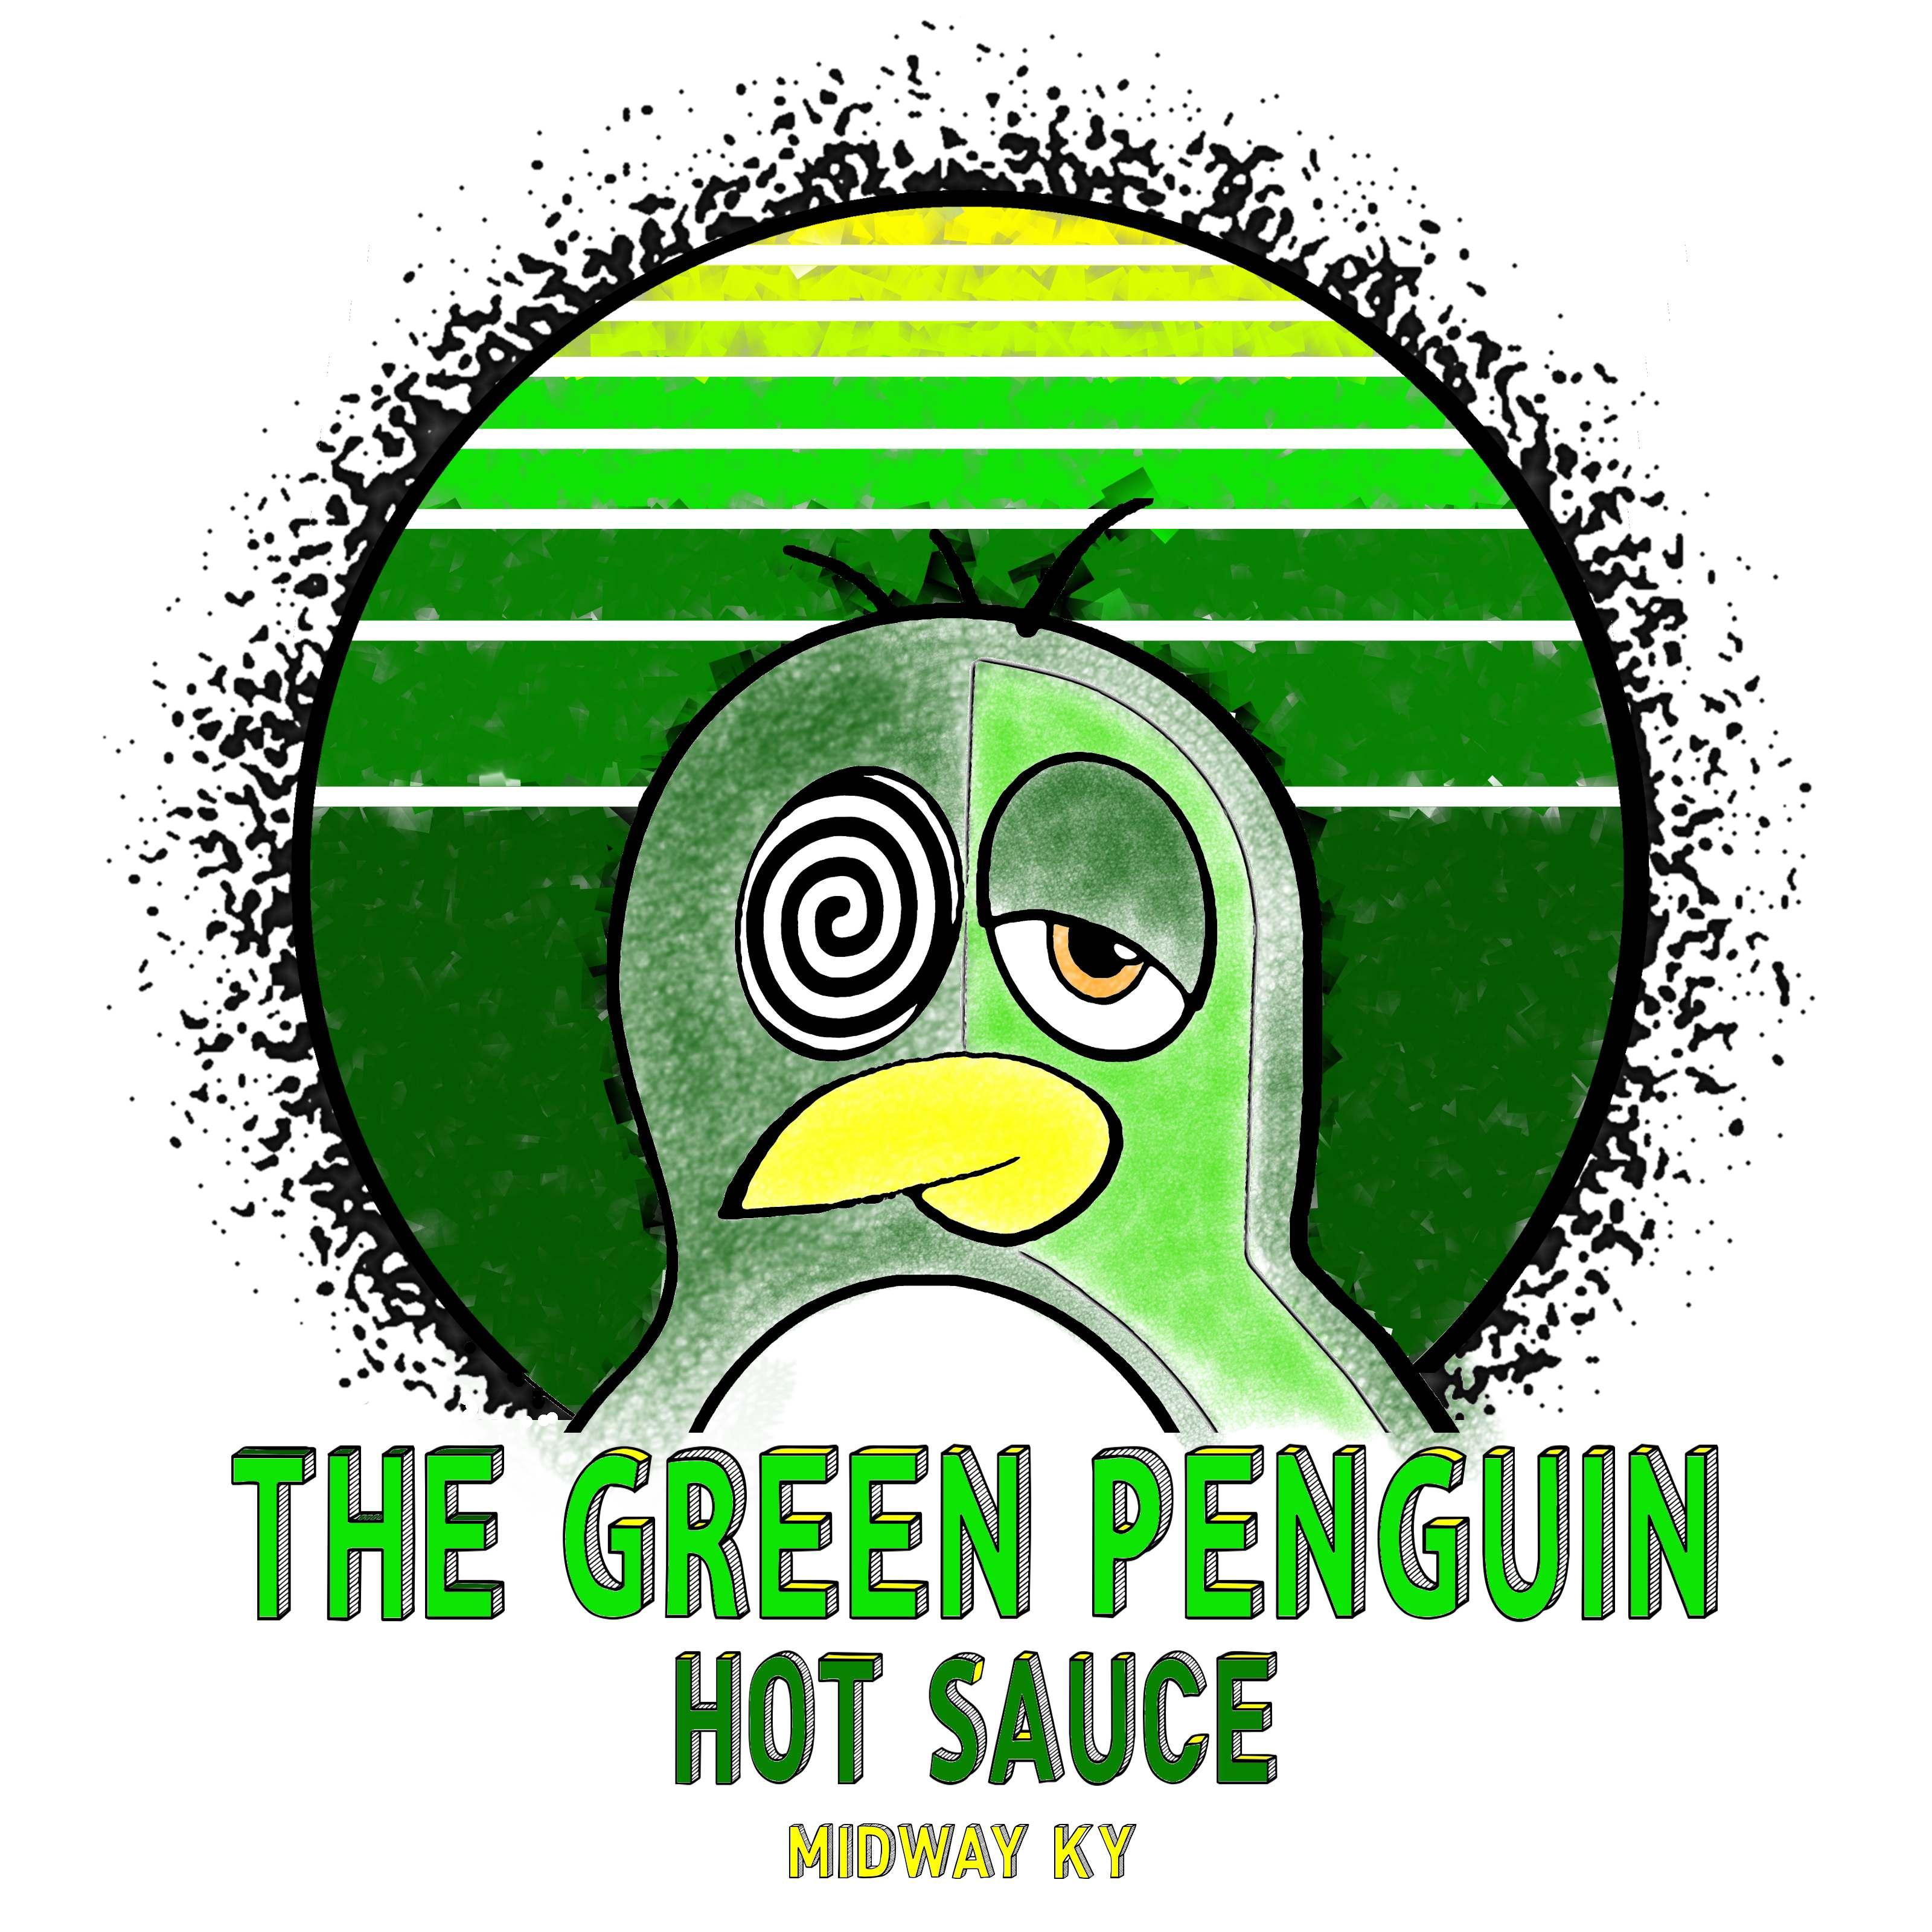 Green Penguin Hot Sauce